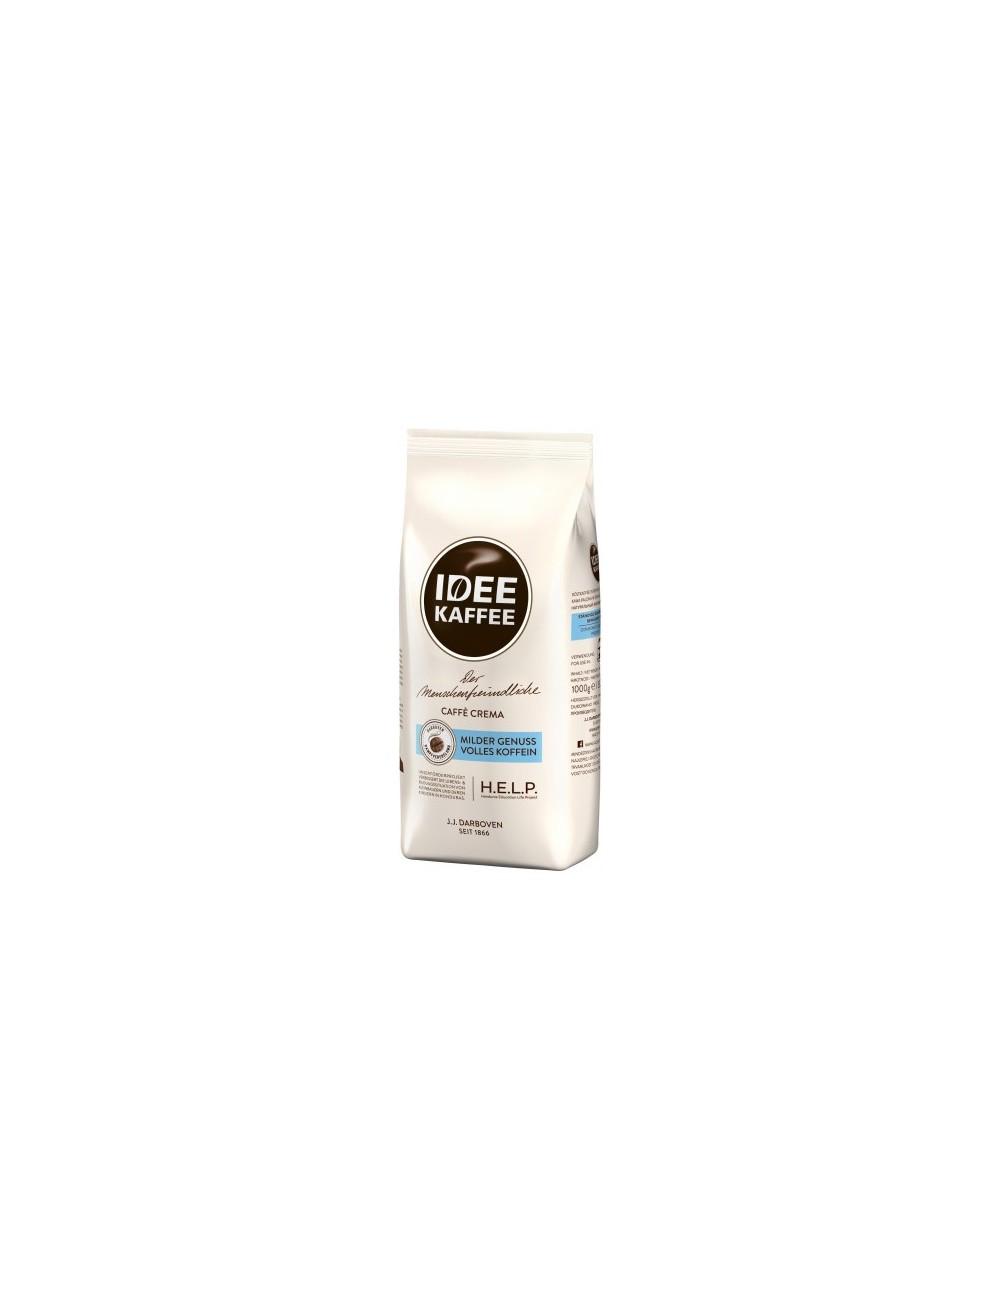 Idee Kaffee Kawa Ziarnista Palona w Torebce Arabika Caffe Crema 1 kg